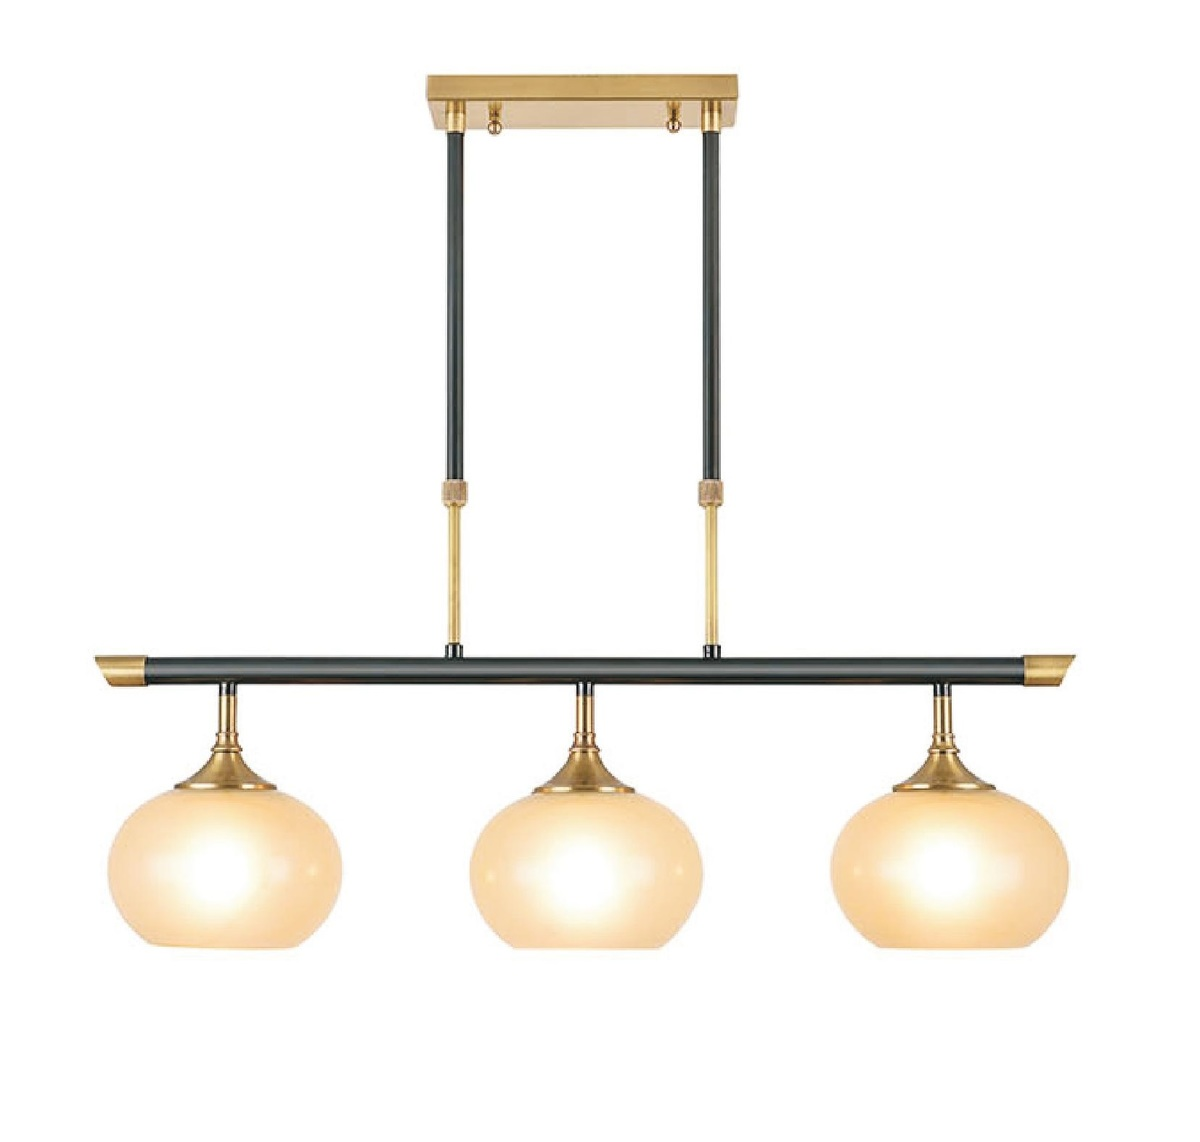 Torfaen-3 Pendant Lamp